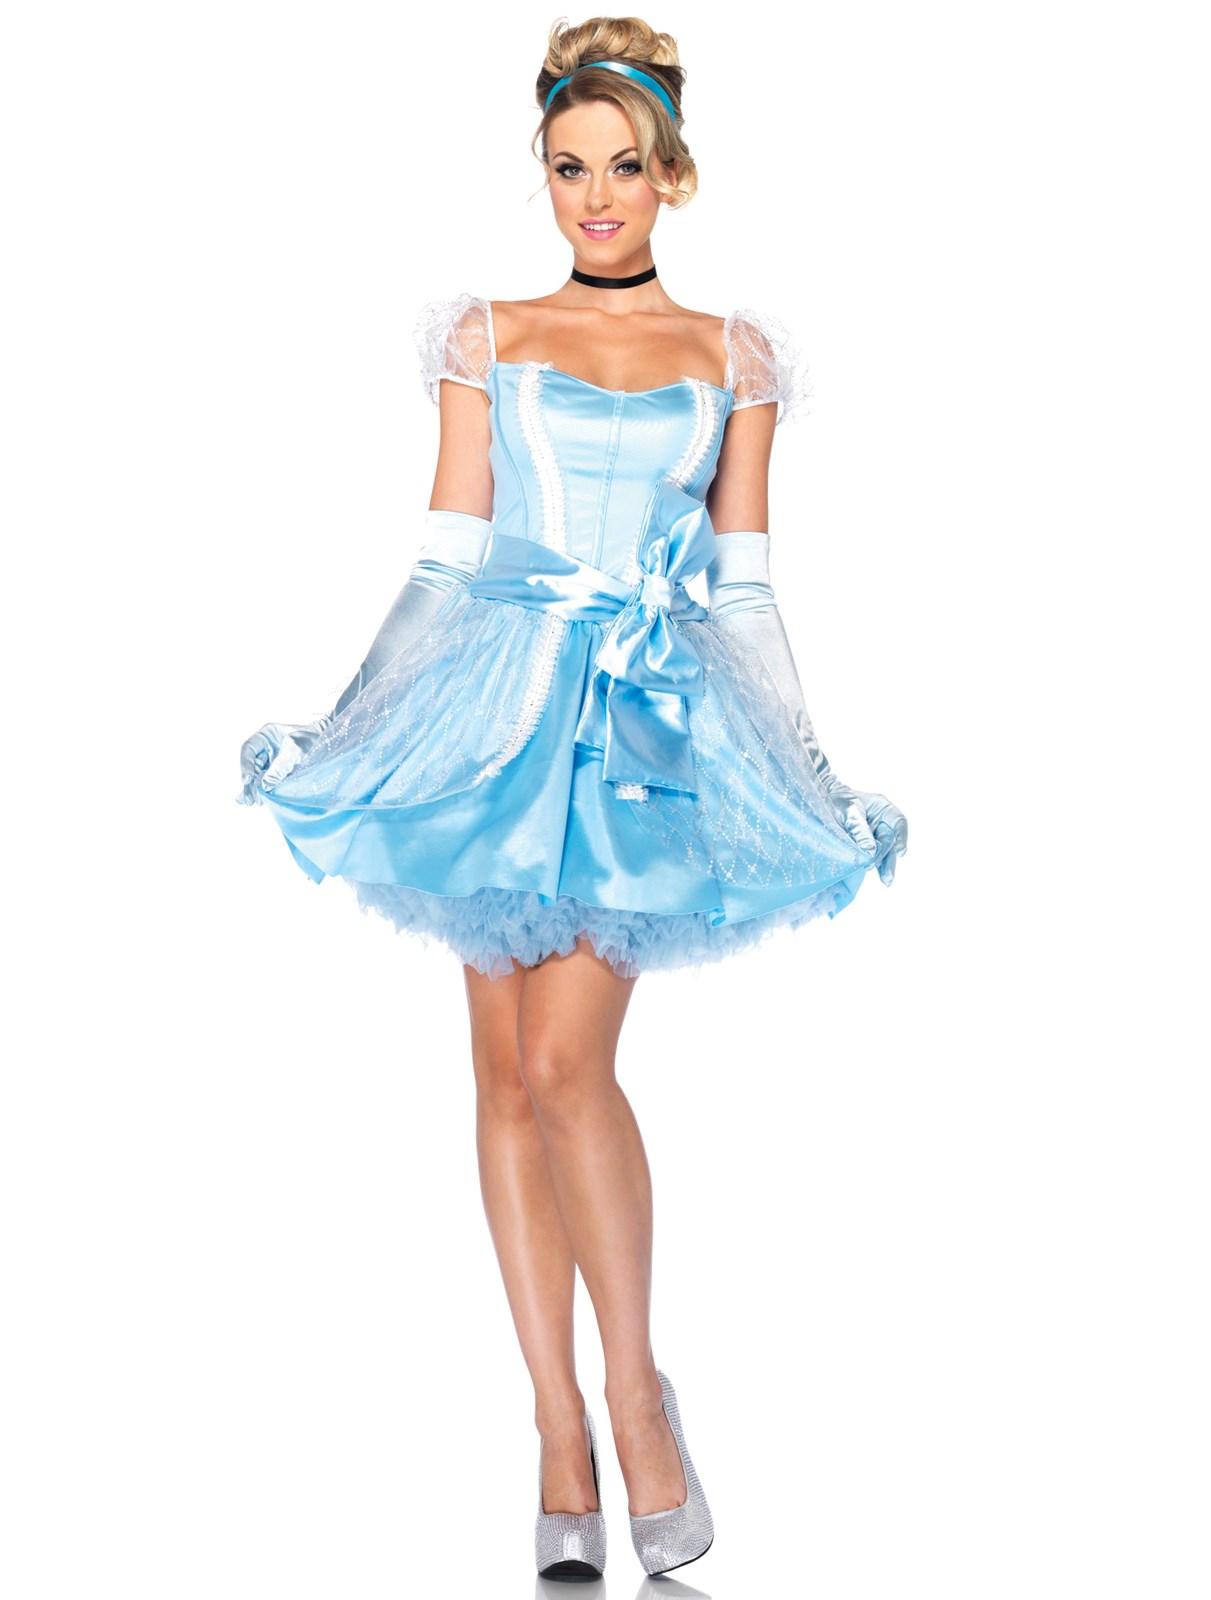 Disney princess gowns for adults - Disney Princesses Glass Slipper Cinderella Adult Costume